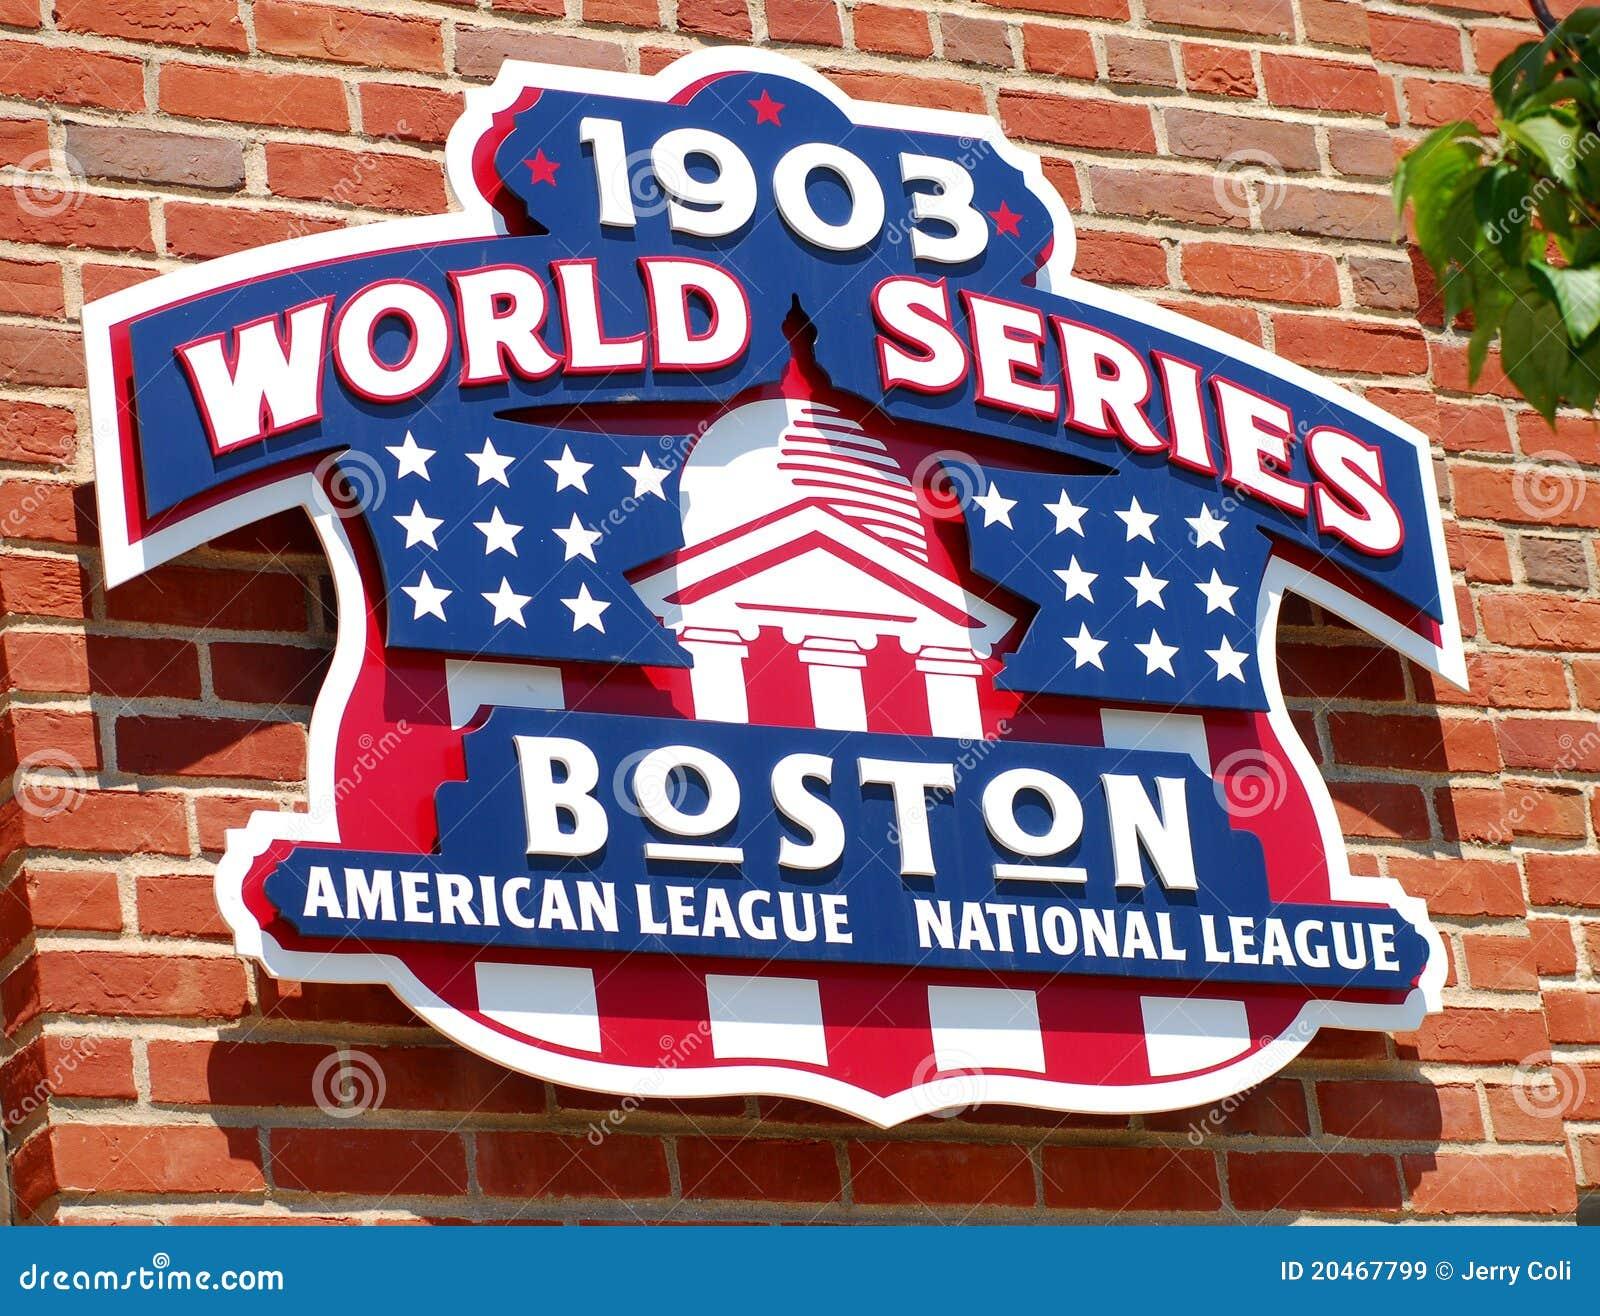 1903 World Series Champions